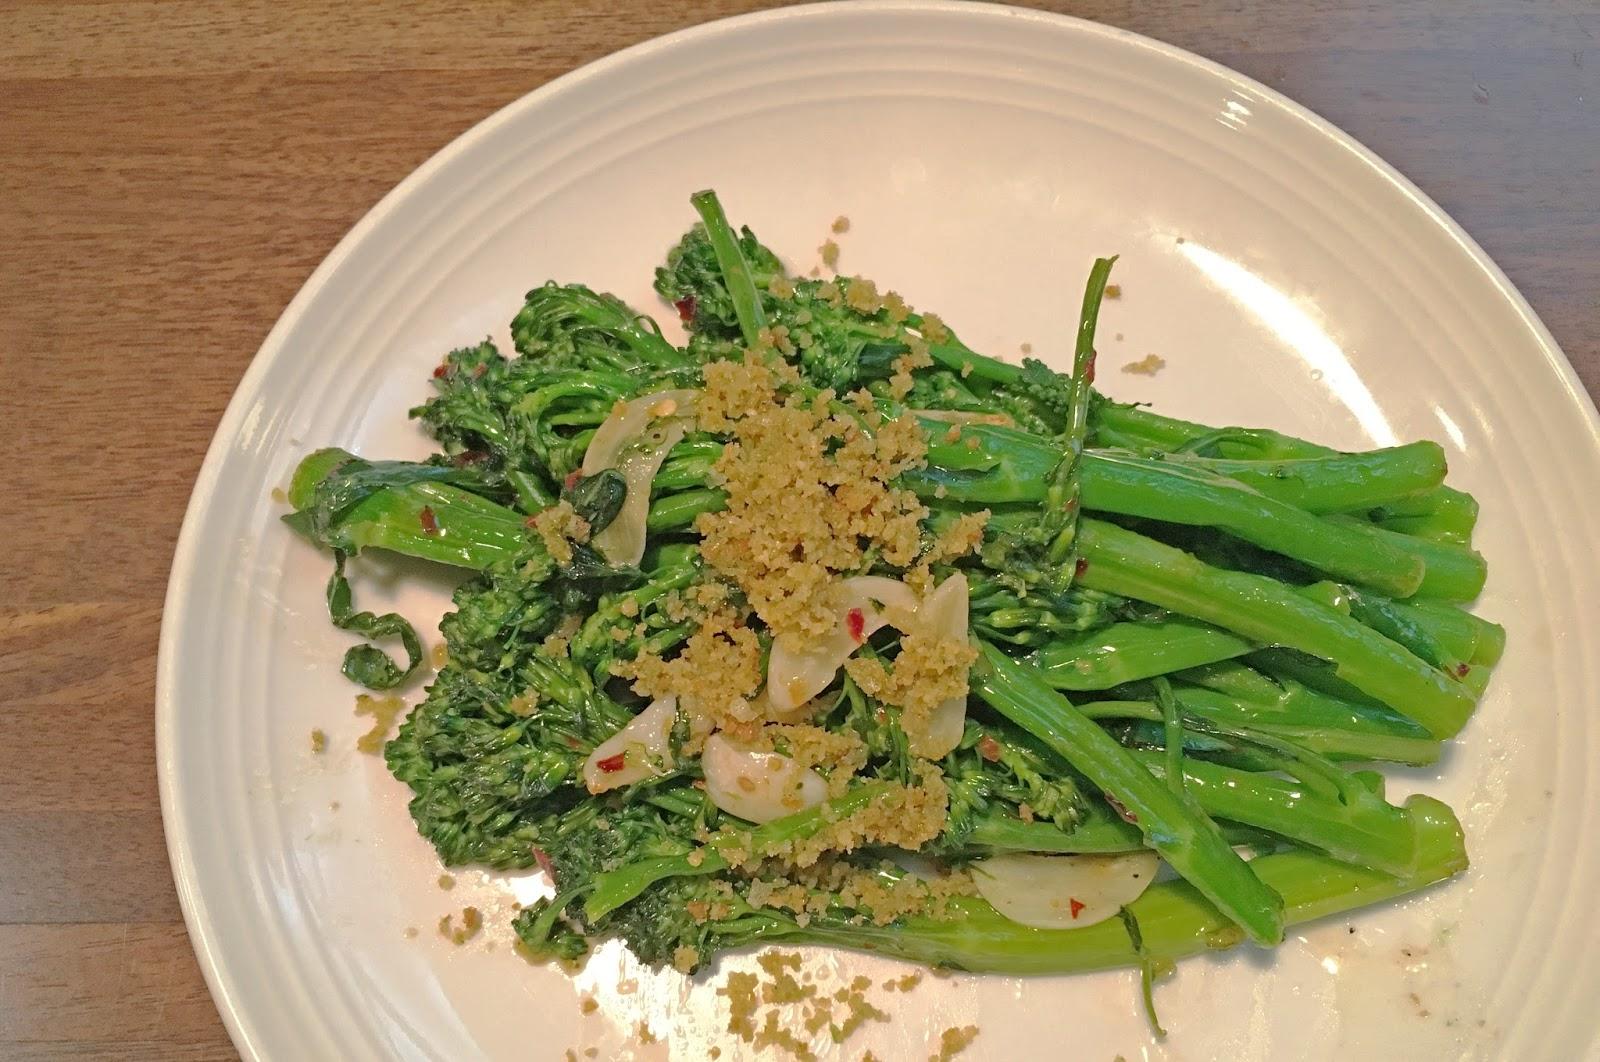 broccolini at Vivo 53 - an Italian restaurant in Fort Worth, Texas